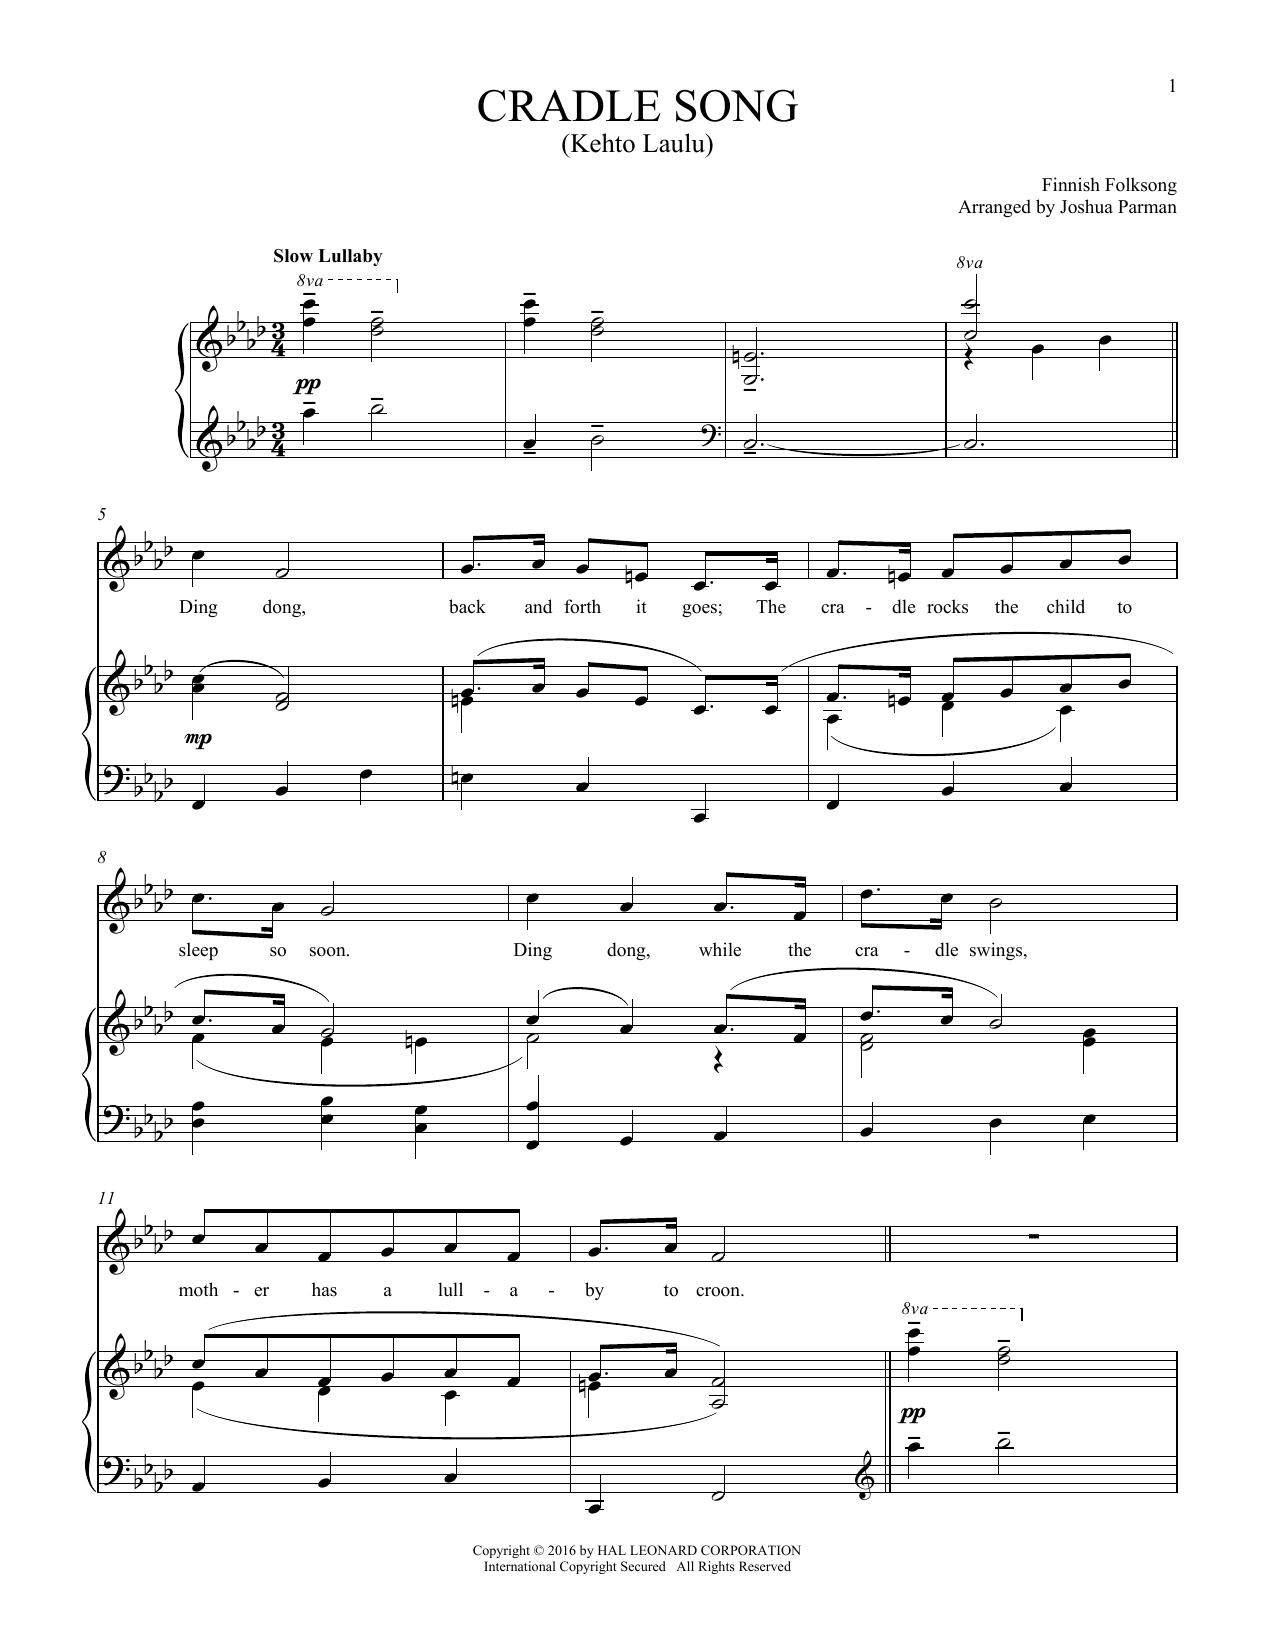 Sheet Music Digital Files To Print Licensed Multicultural Digital